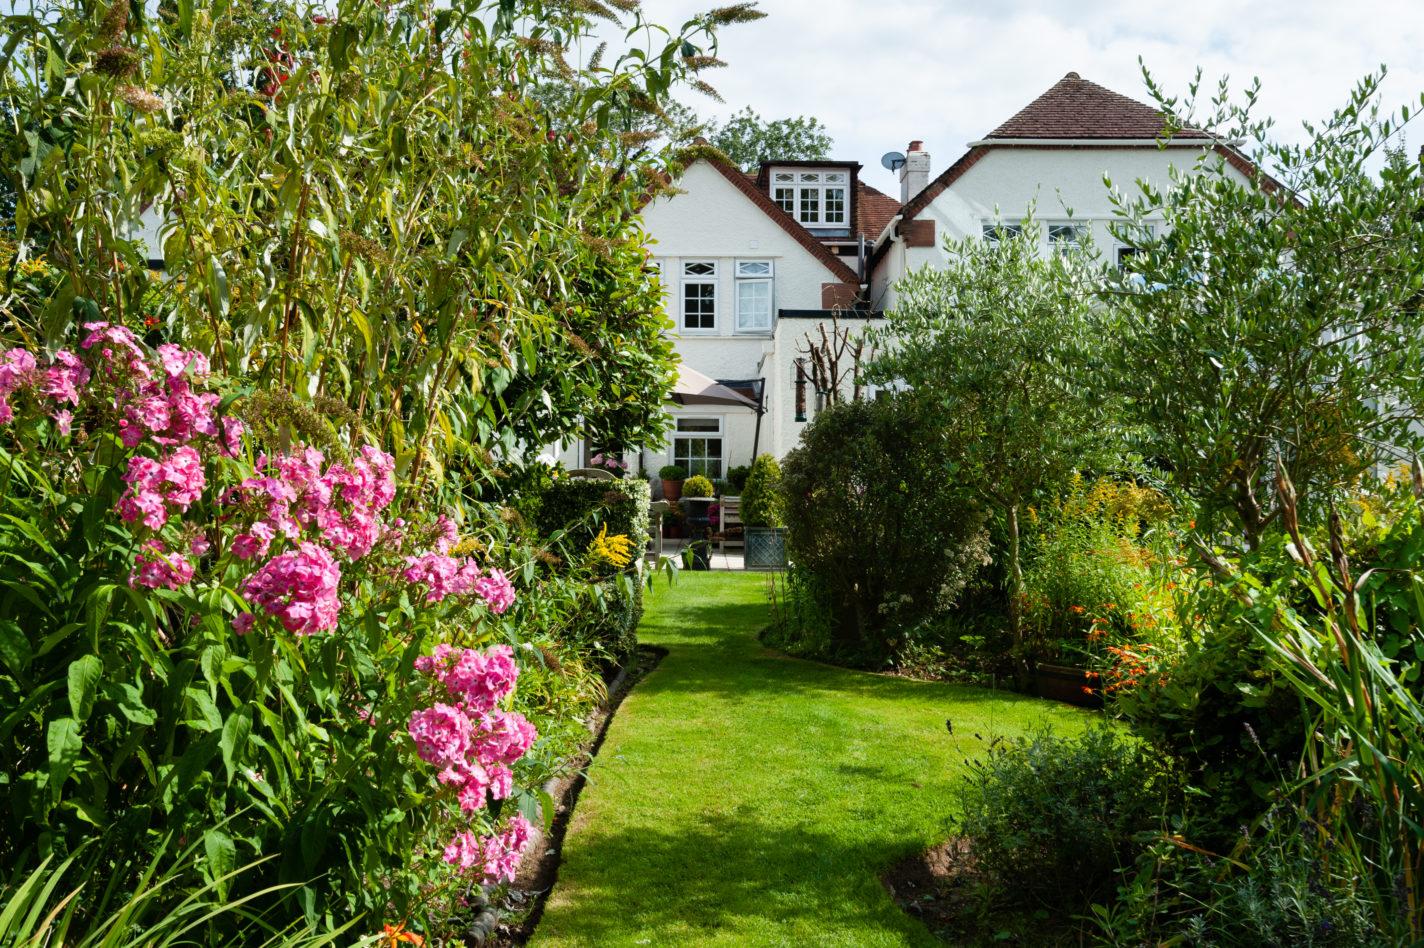 Our gorgeous garden